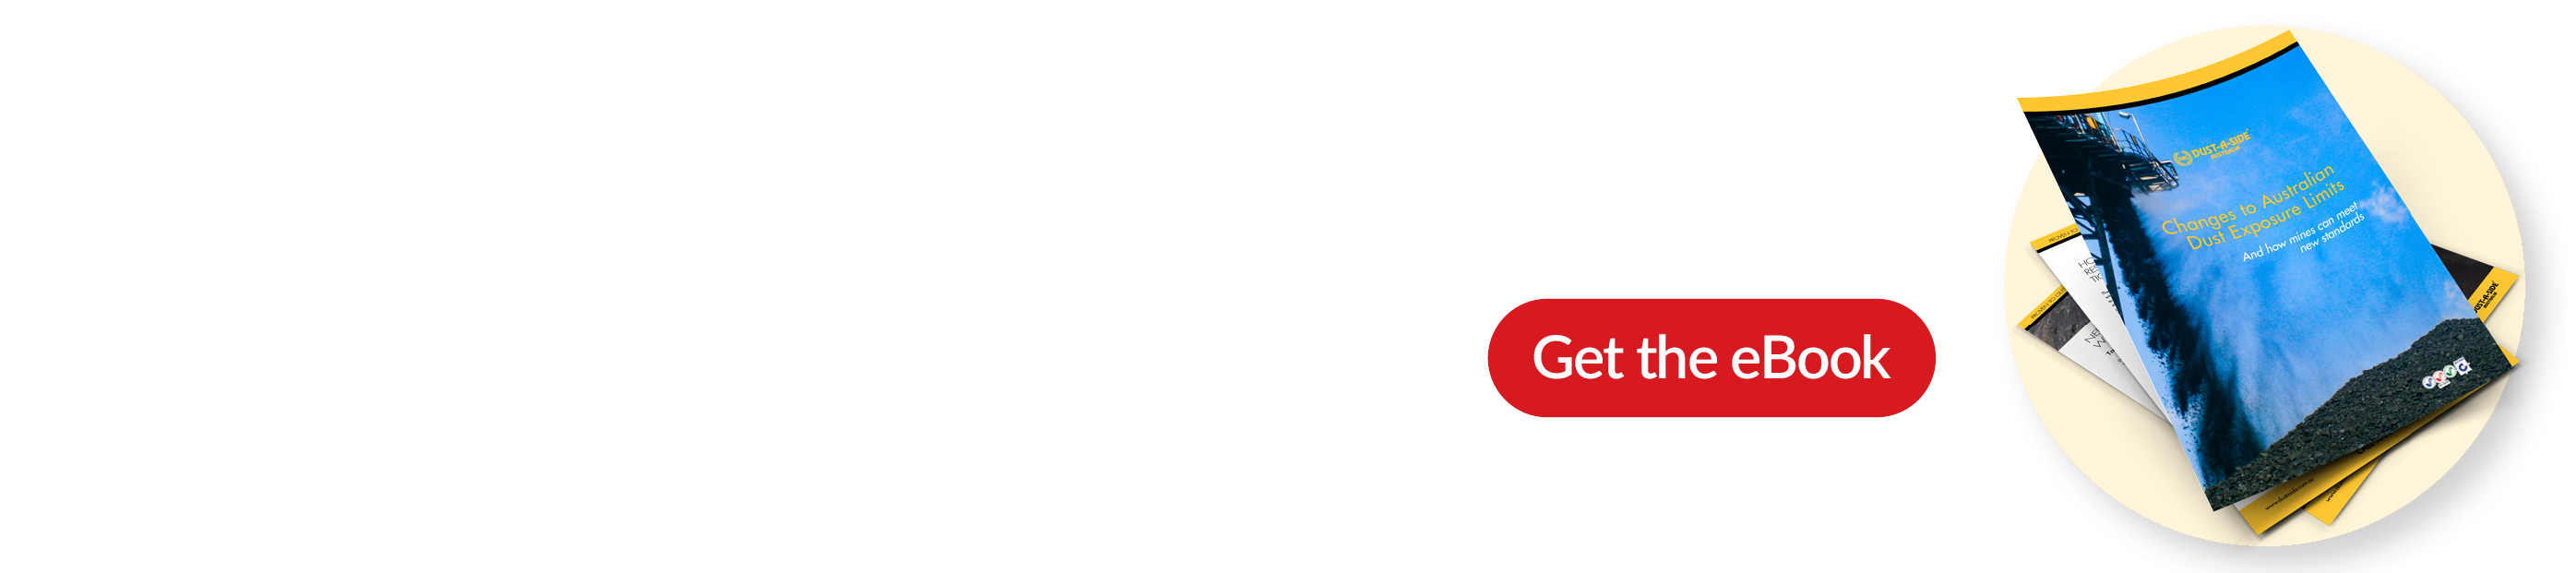 Changes to Australian Dust Exposure Limits